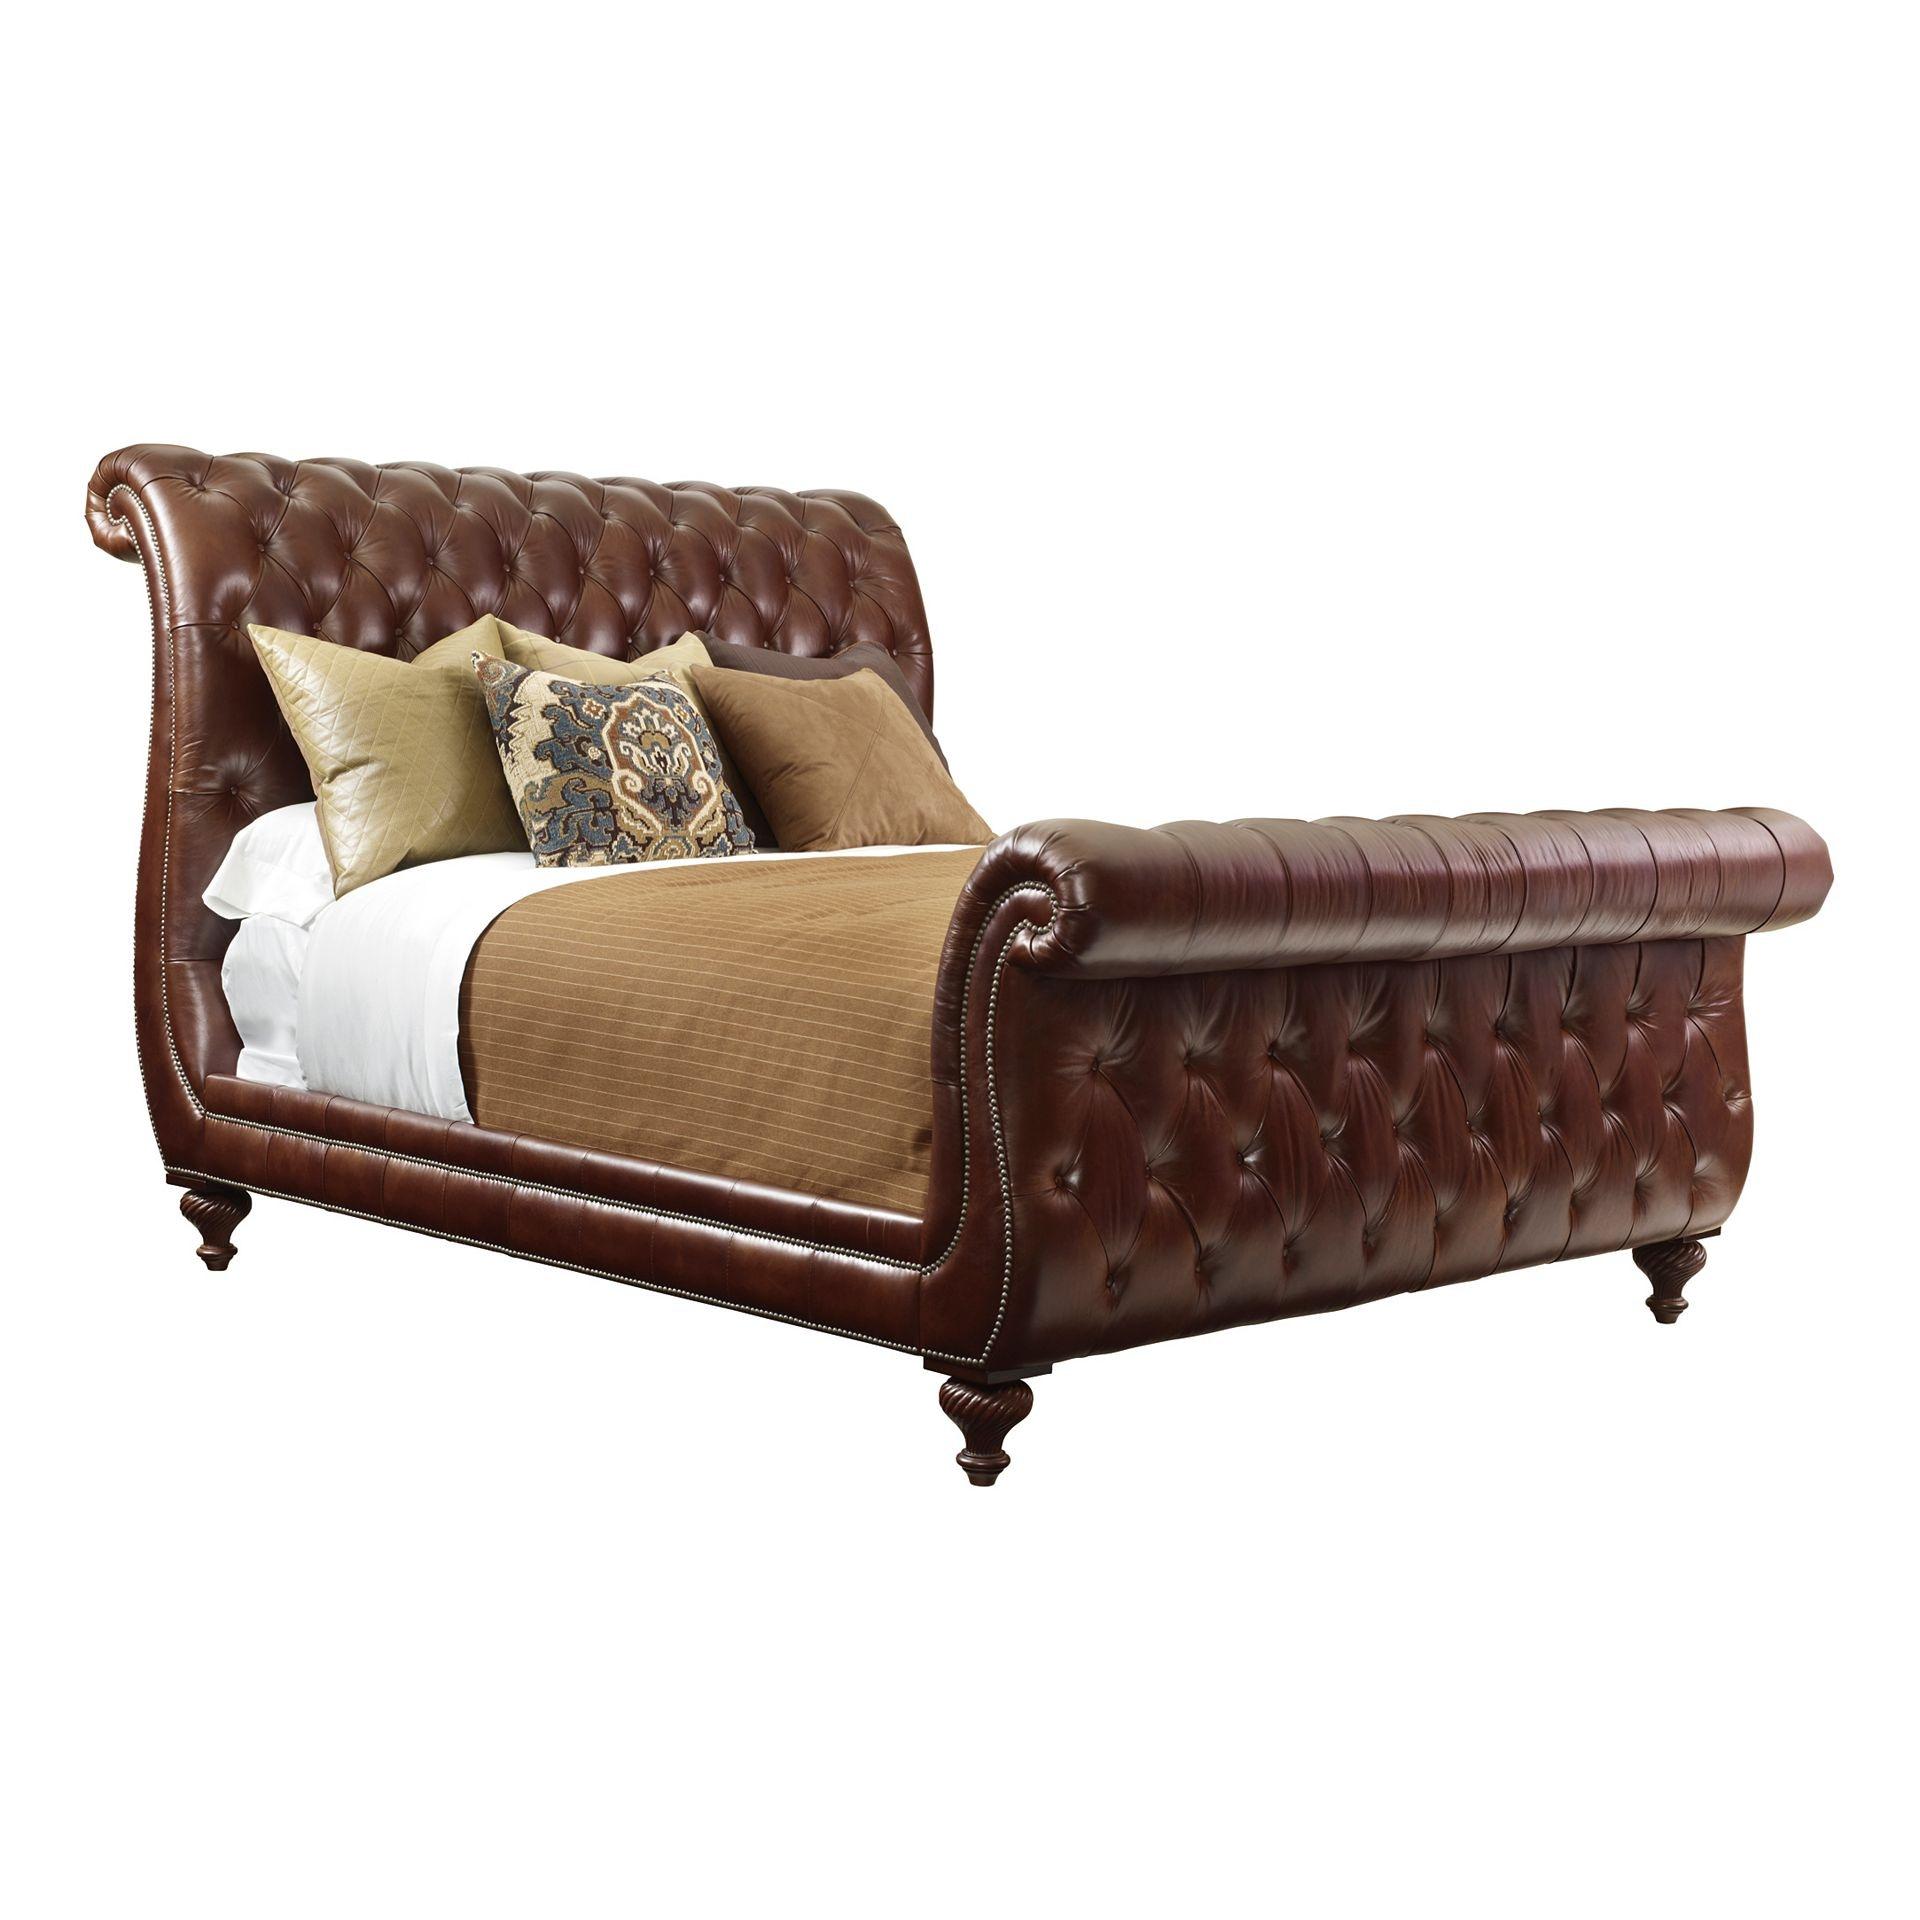 Henredon Furniture Henredon Leather Company Churchill King Bed Henredon  Furniture IL8826 12